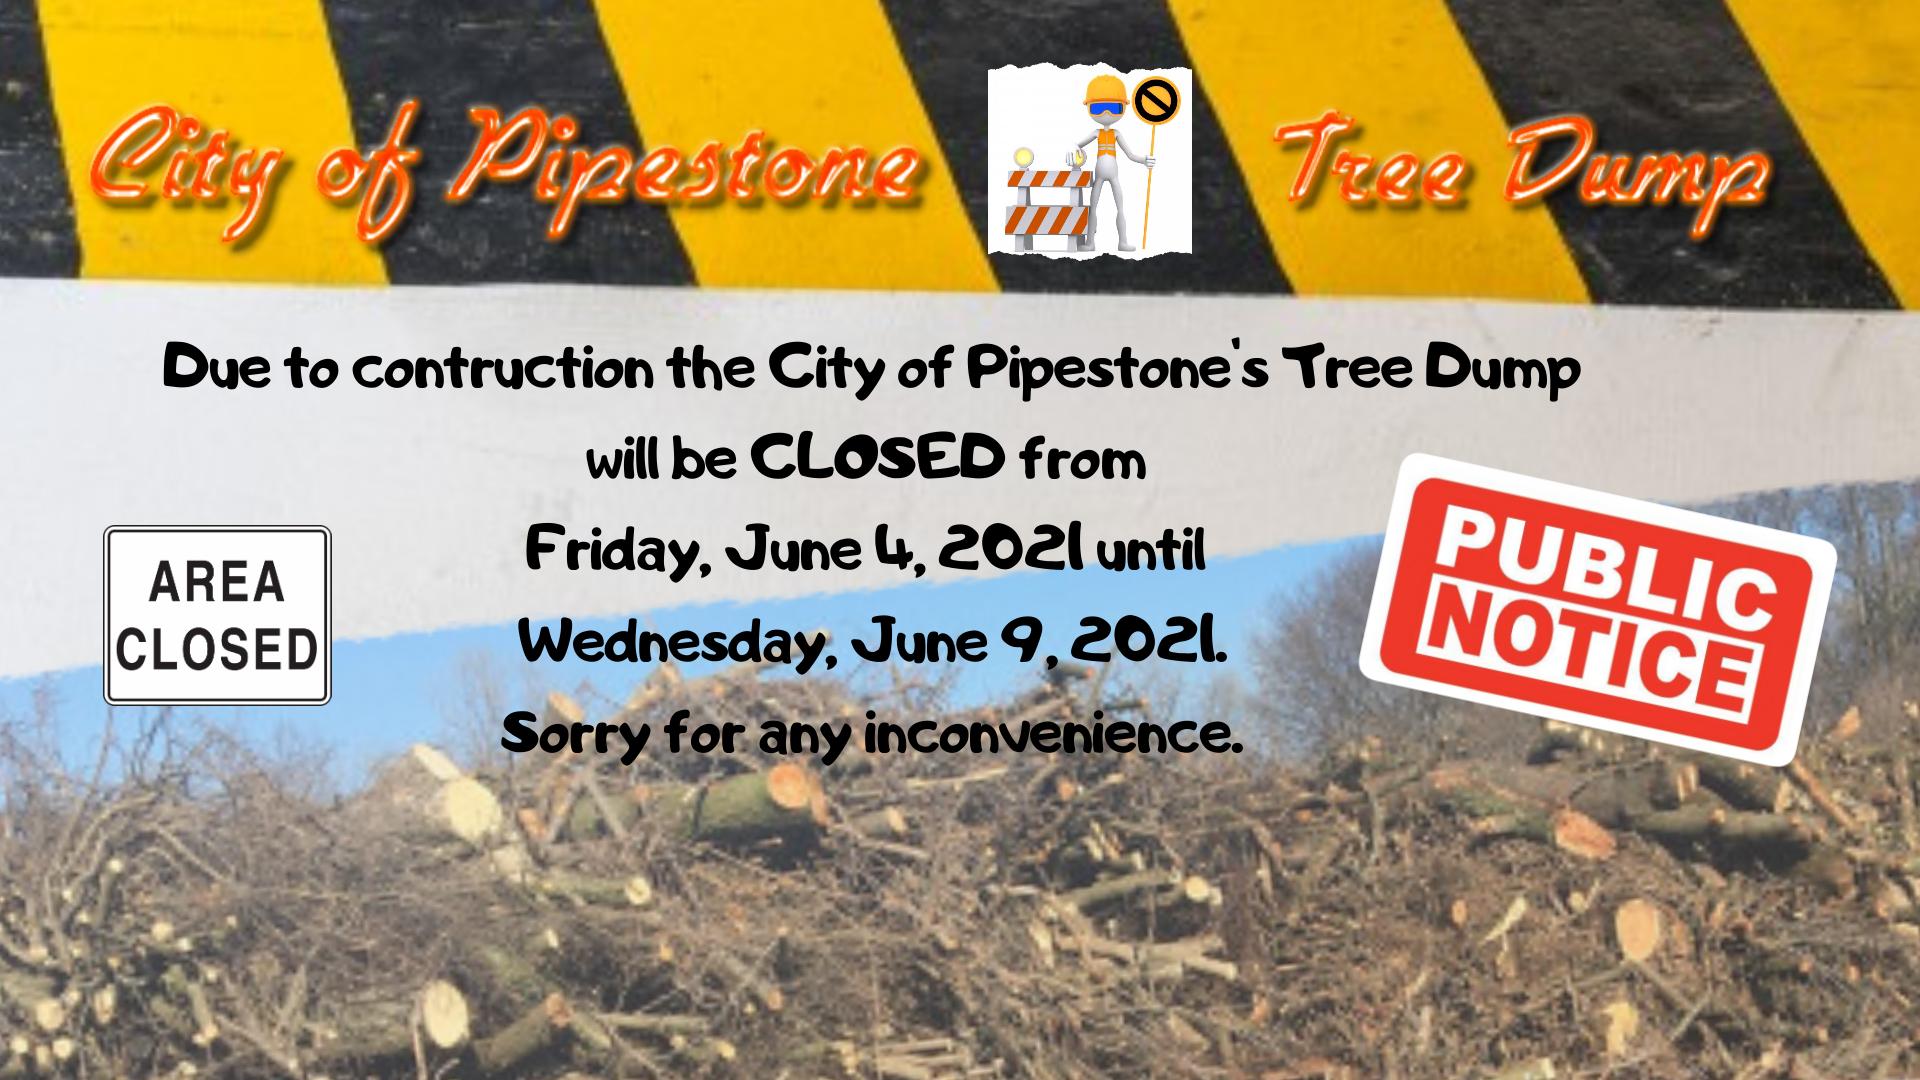 Tree Dump Closed June 4 thru approximately June 9